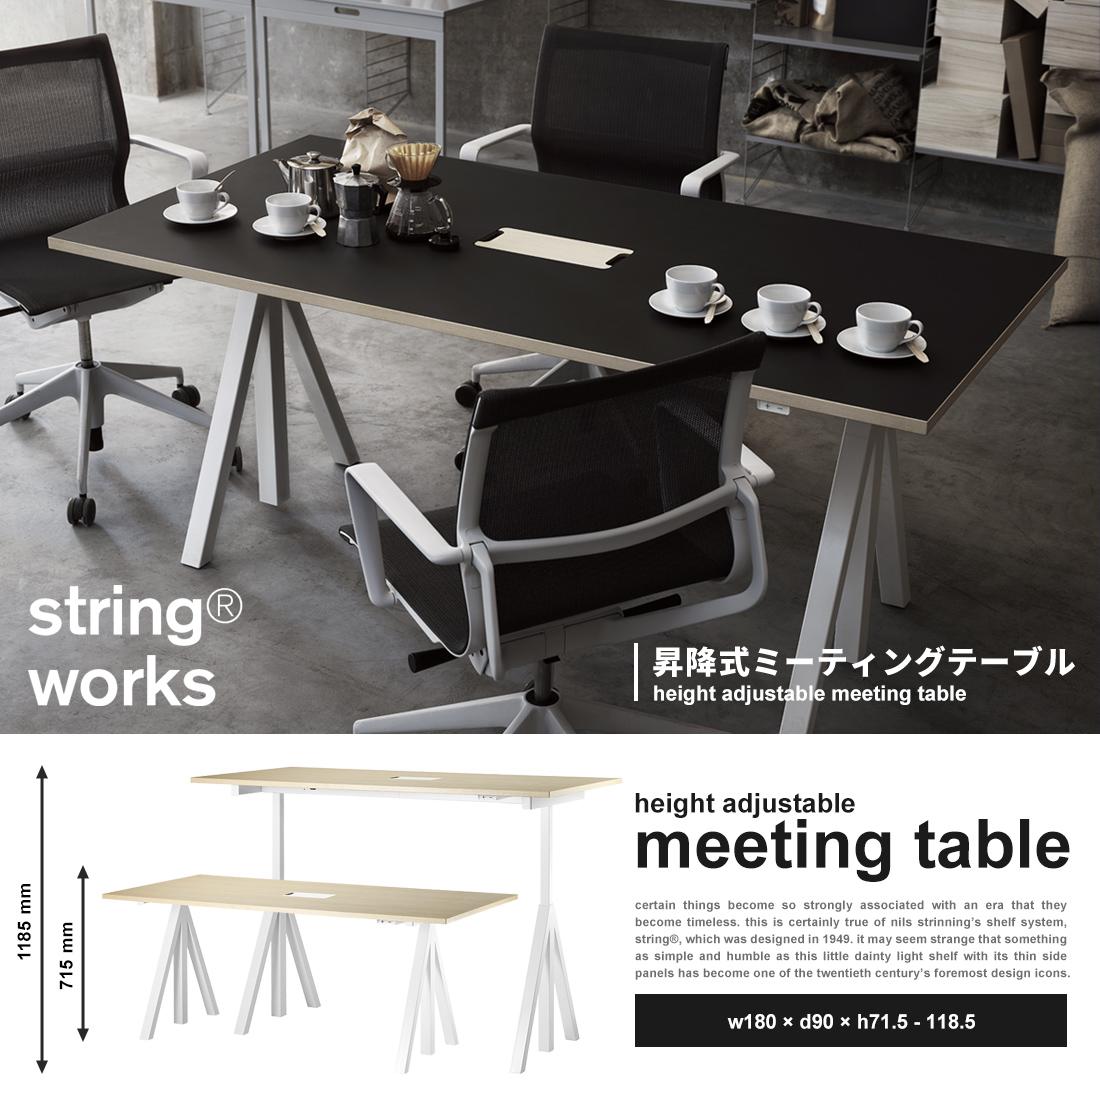 【string ストリング】string works Meeting Table ストリング ワークス 昇降式ミーティングテーブル W180机 テーブル 作業台 折りたたみ式 折り畳みテーブル ダイニングテーブル